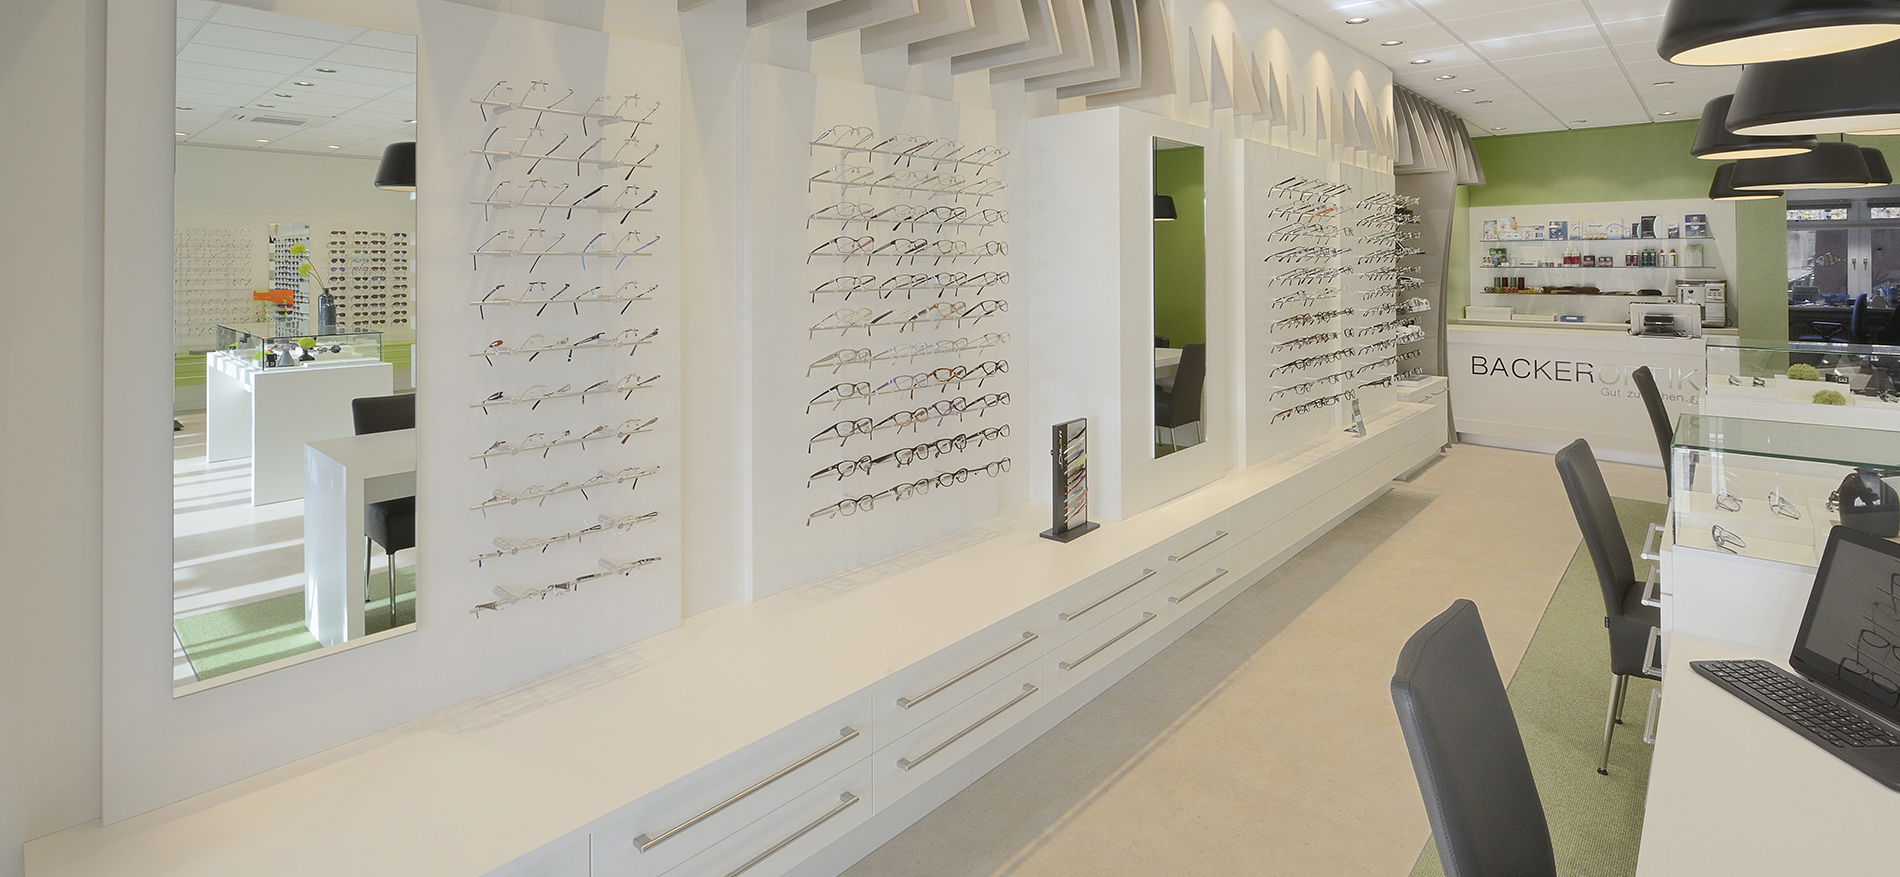 Einrichting Augenoptiker Backer Optik WSB Ladenbau_